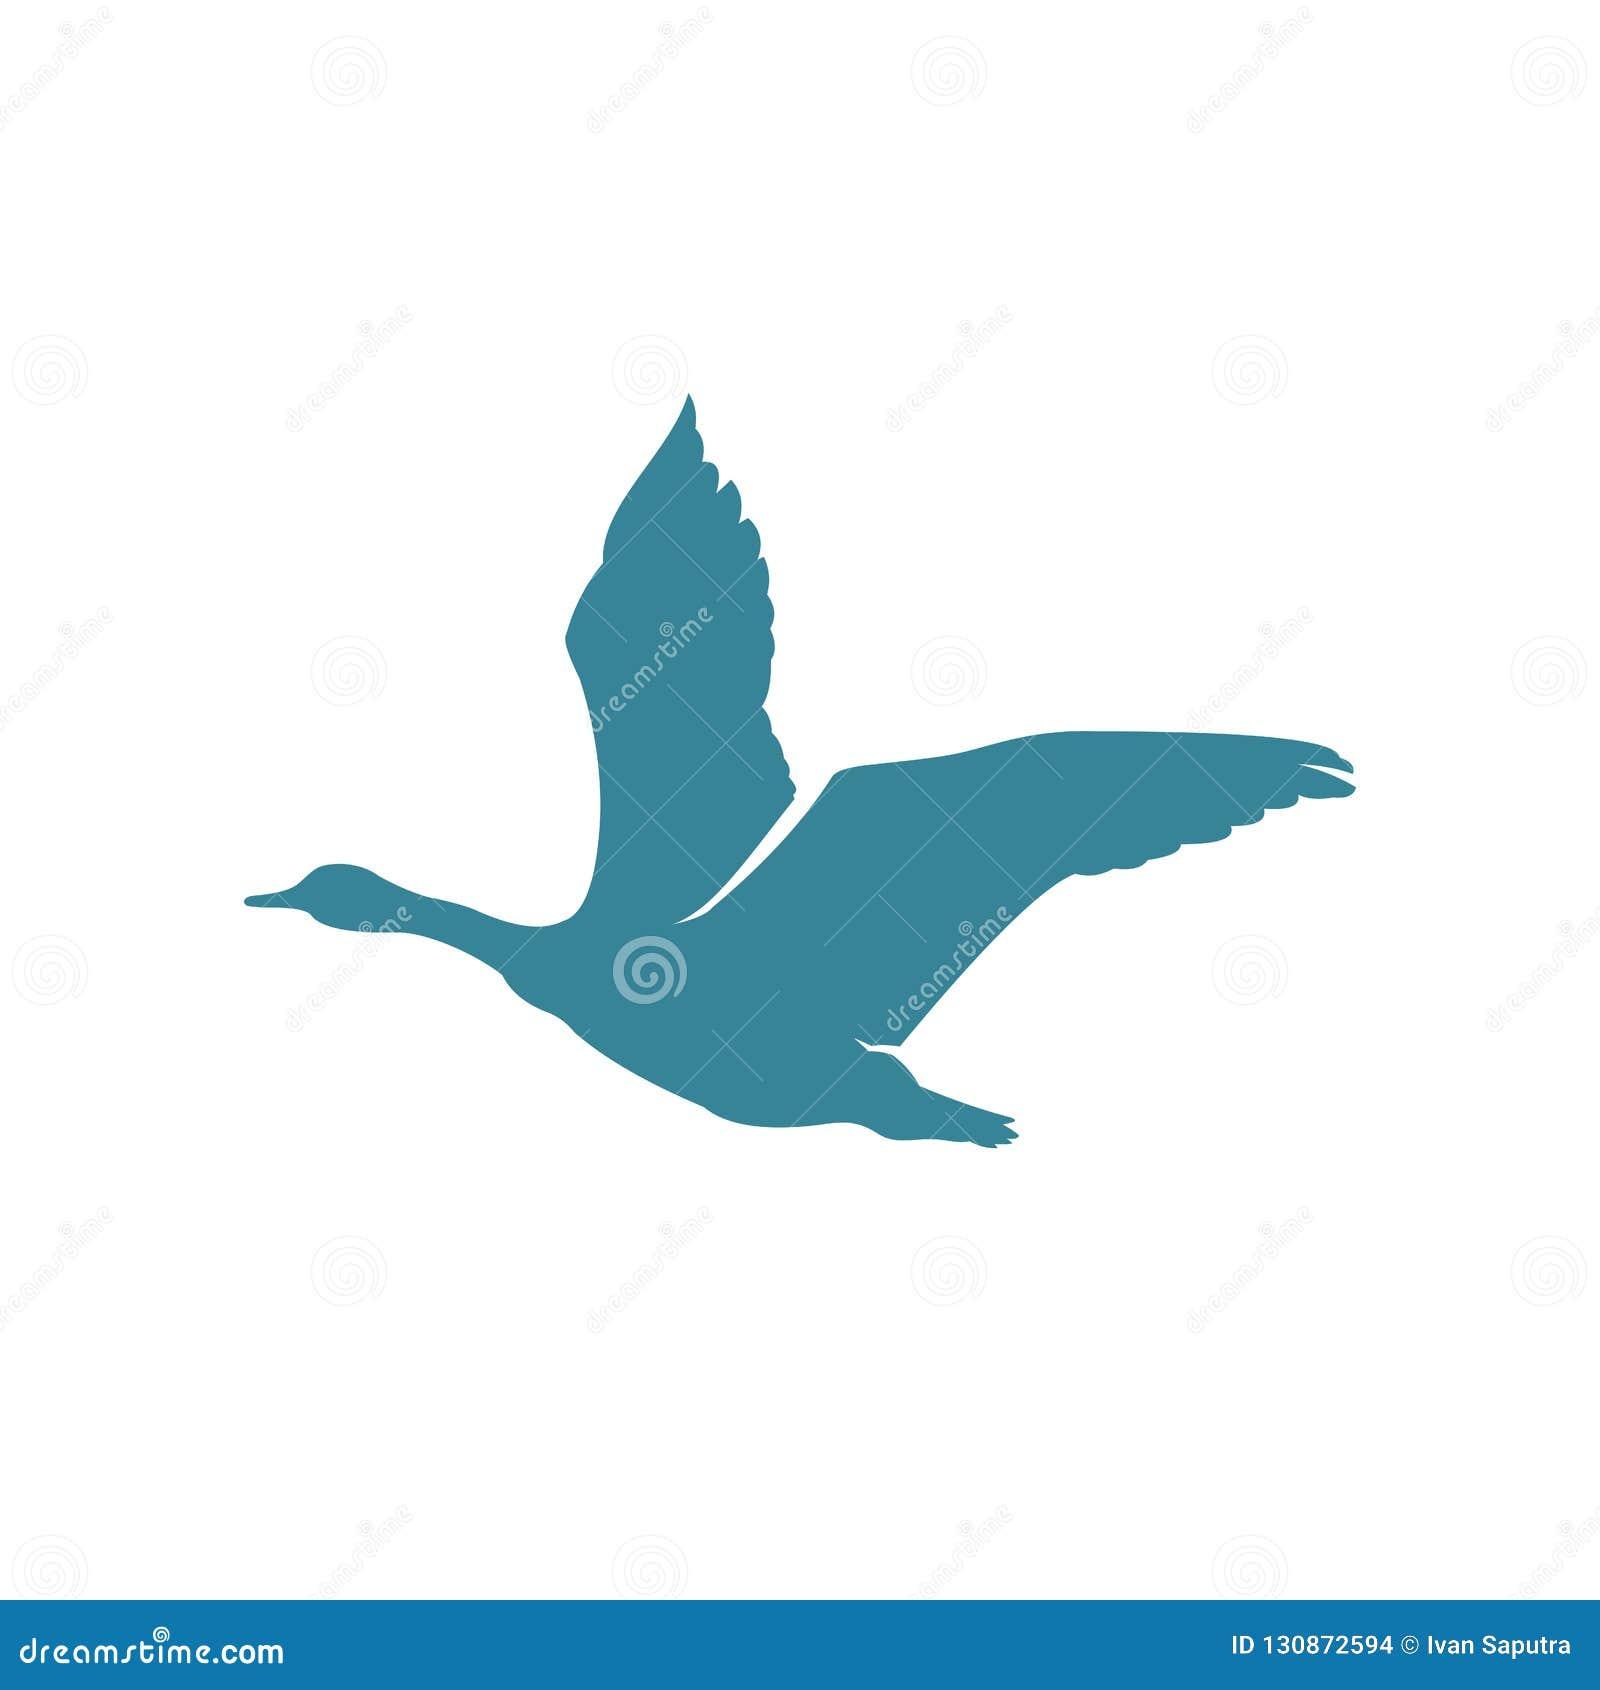 Hook Duck Stock Illustrations – 258 Hook Duck Stock Illustrations, Vectors  & Clipart - Dreamstime